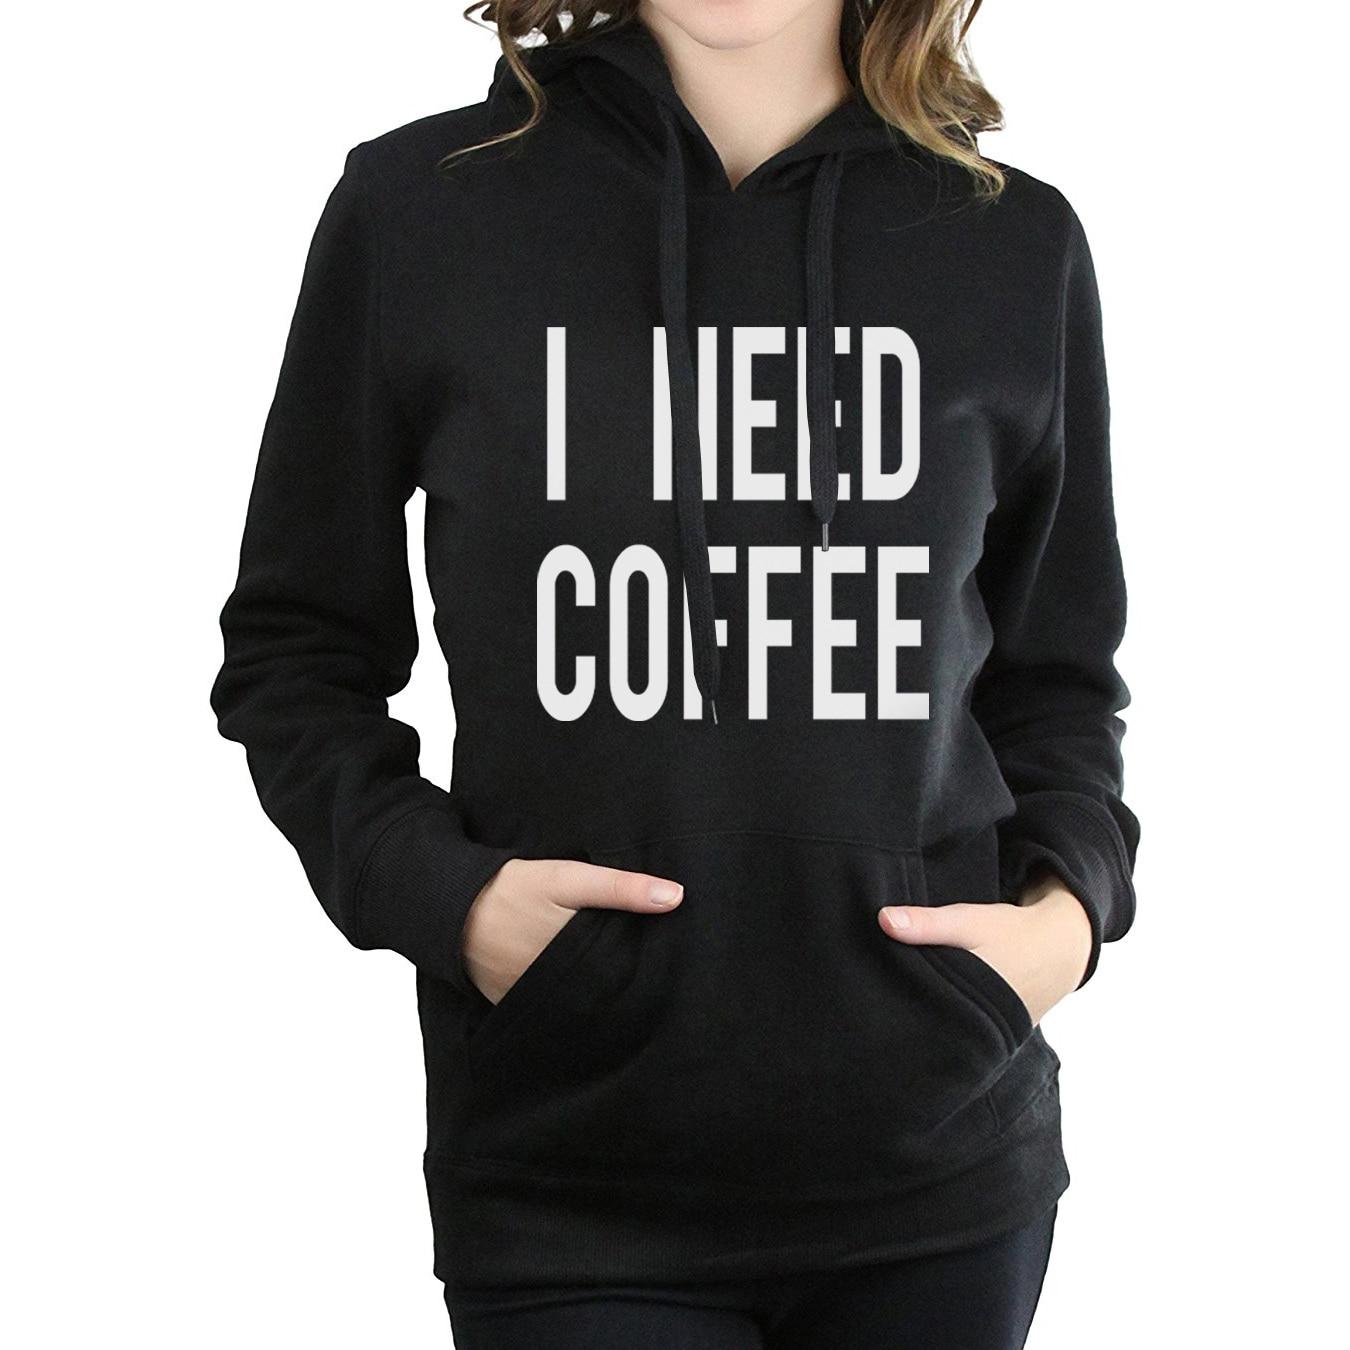 fitness  brand hoodies femme l Need Coffee women hip-hop sweatshirts 2017 autumn hipster harajuku tracksuits funny hoody